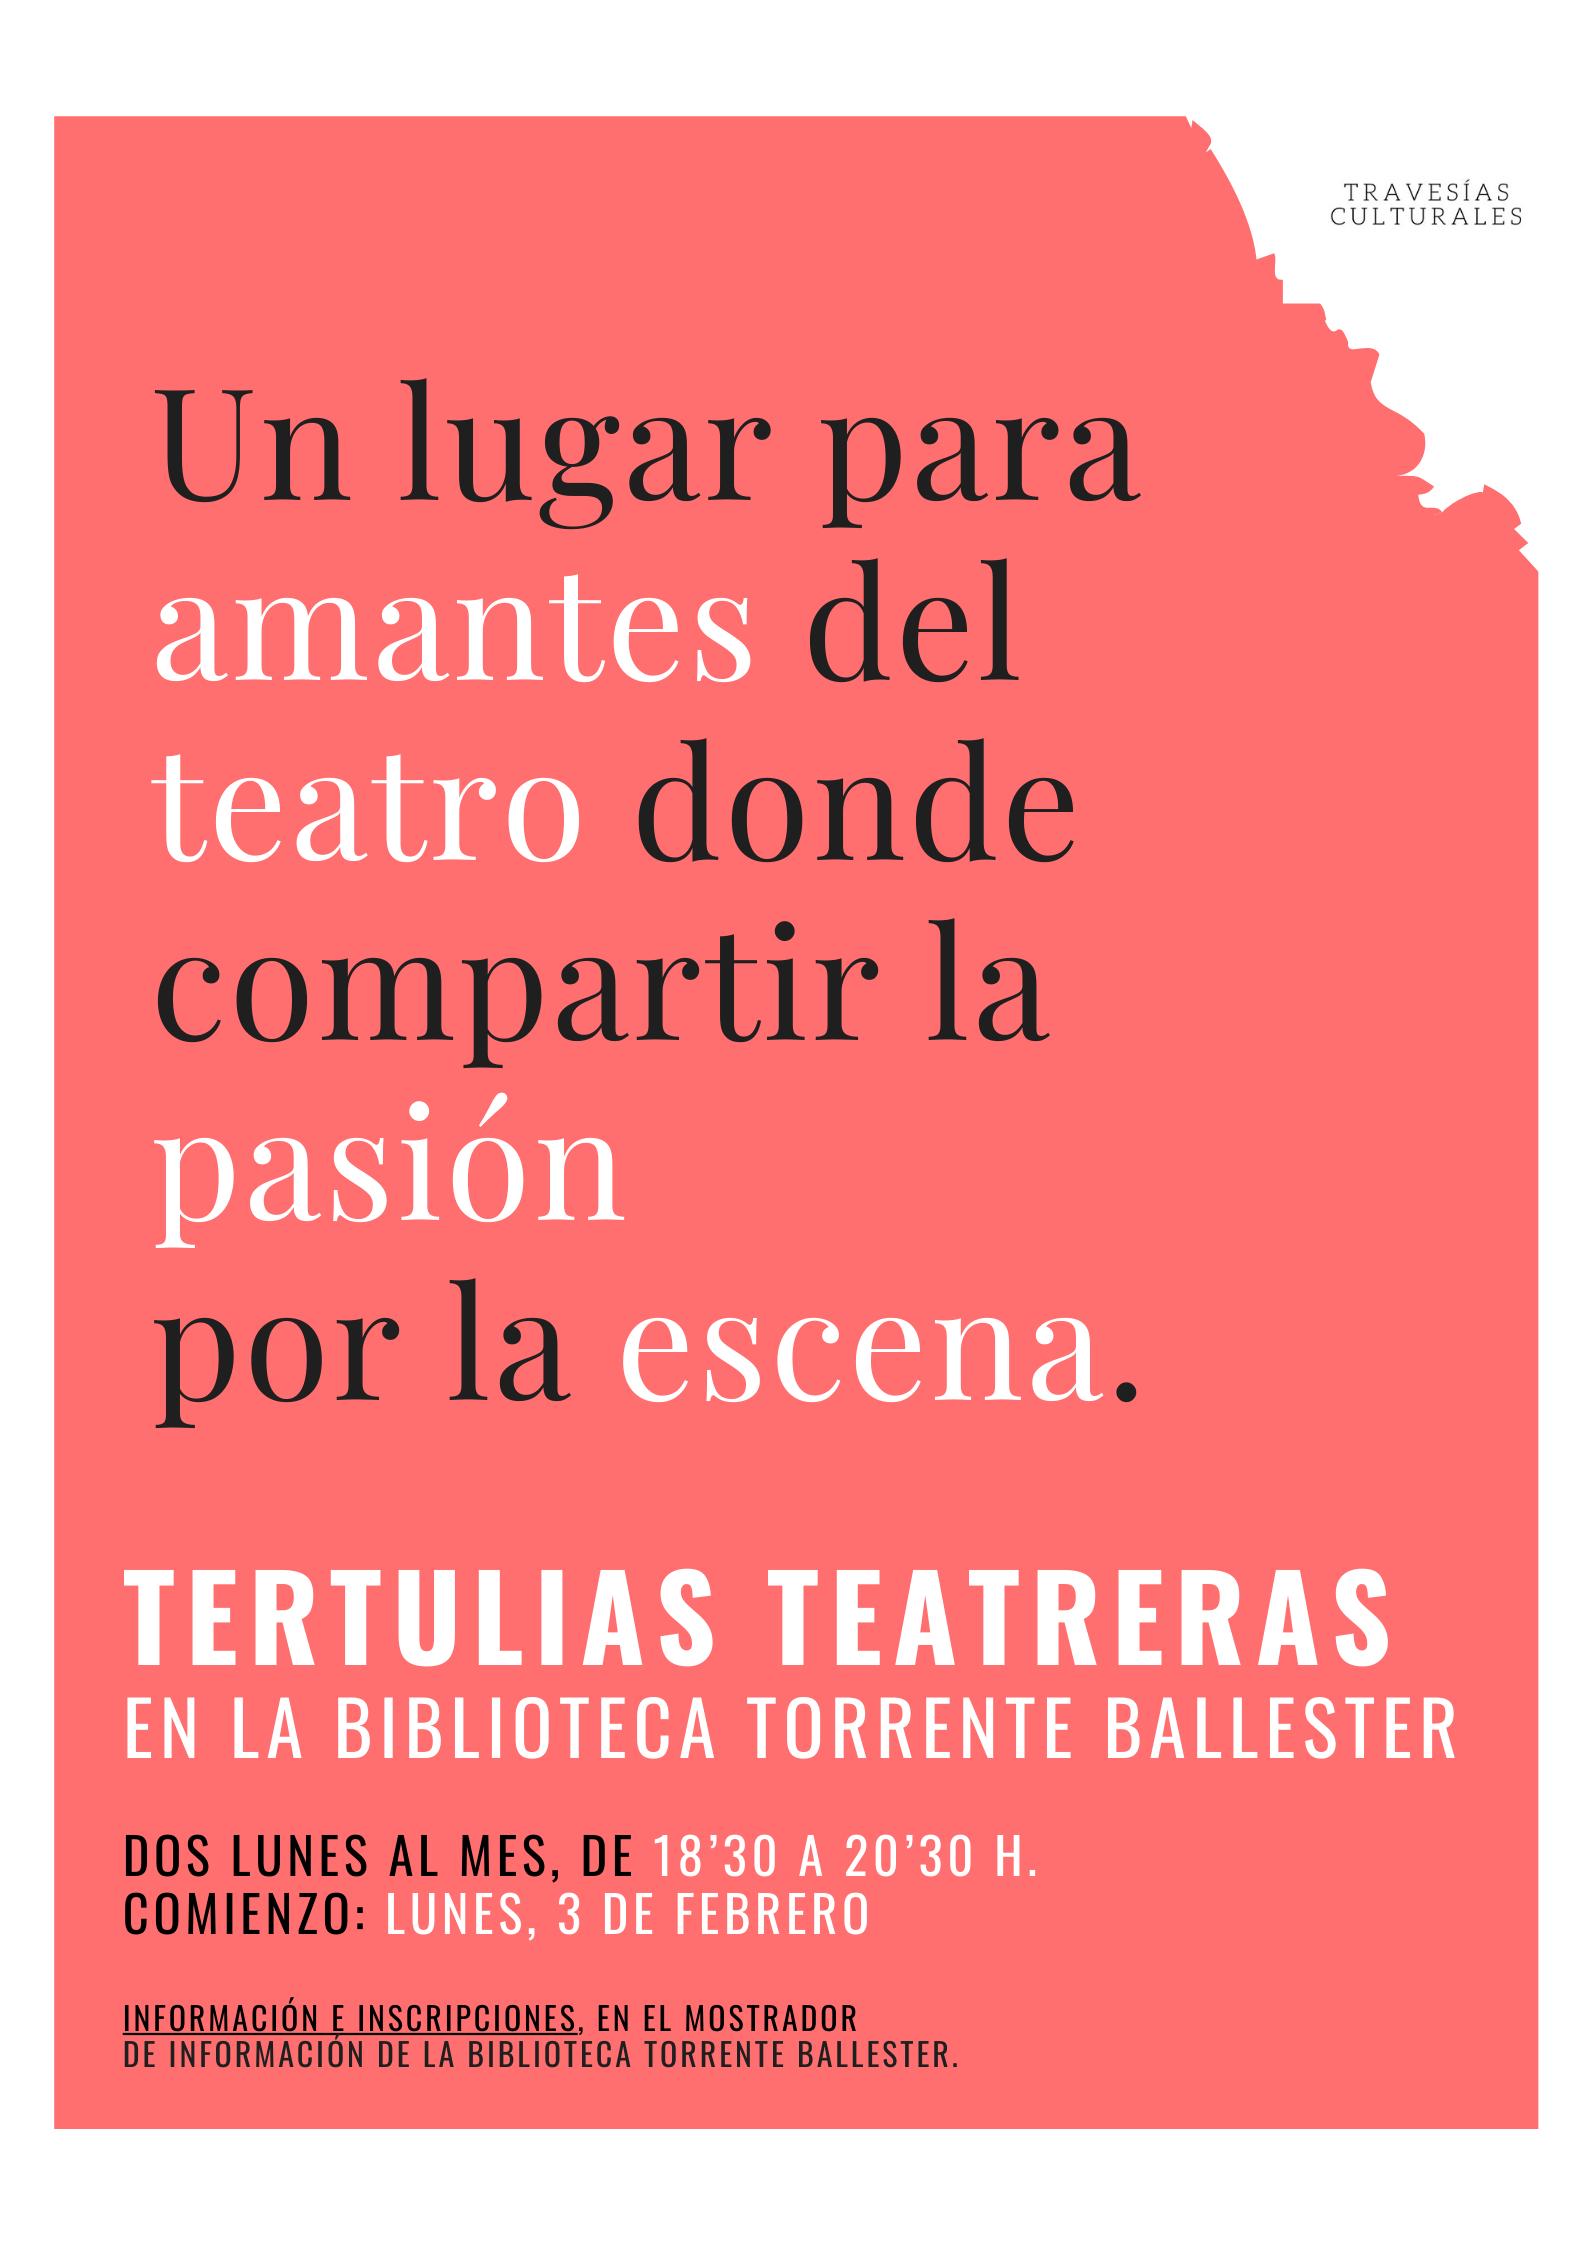 TERTULIAS TEATRERAS